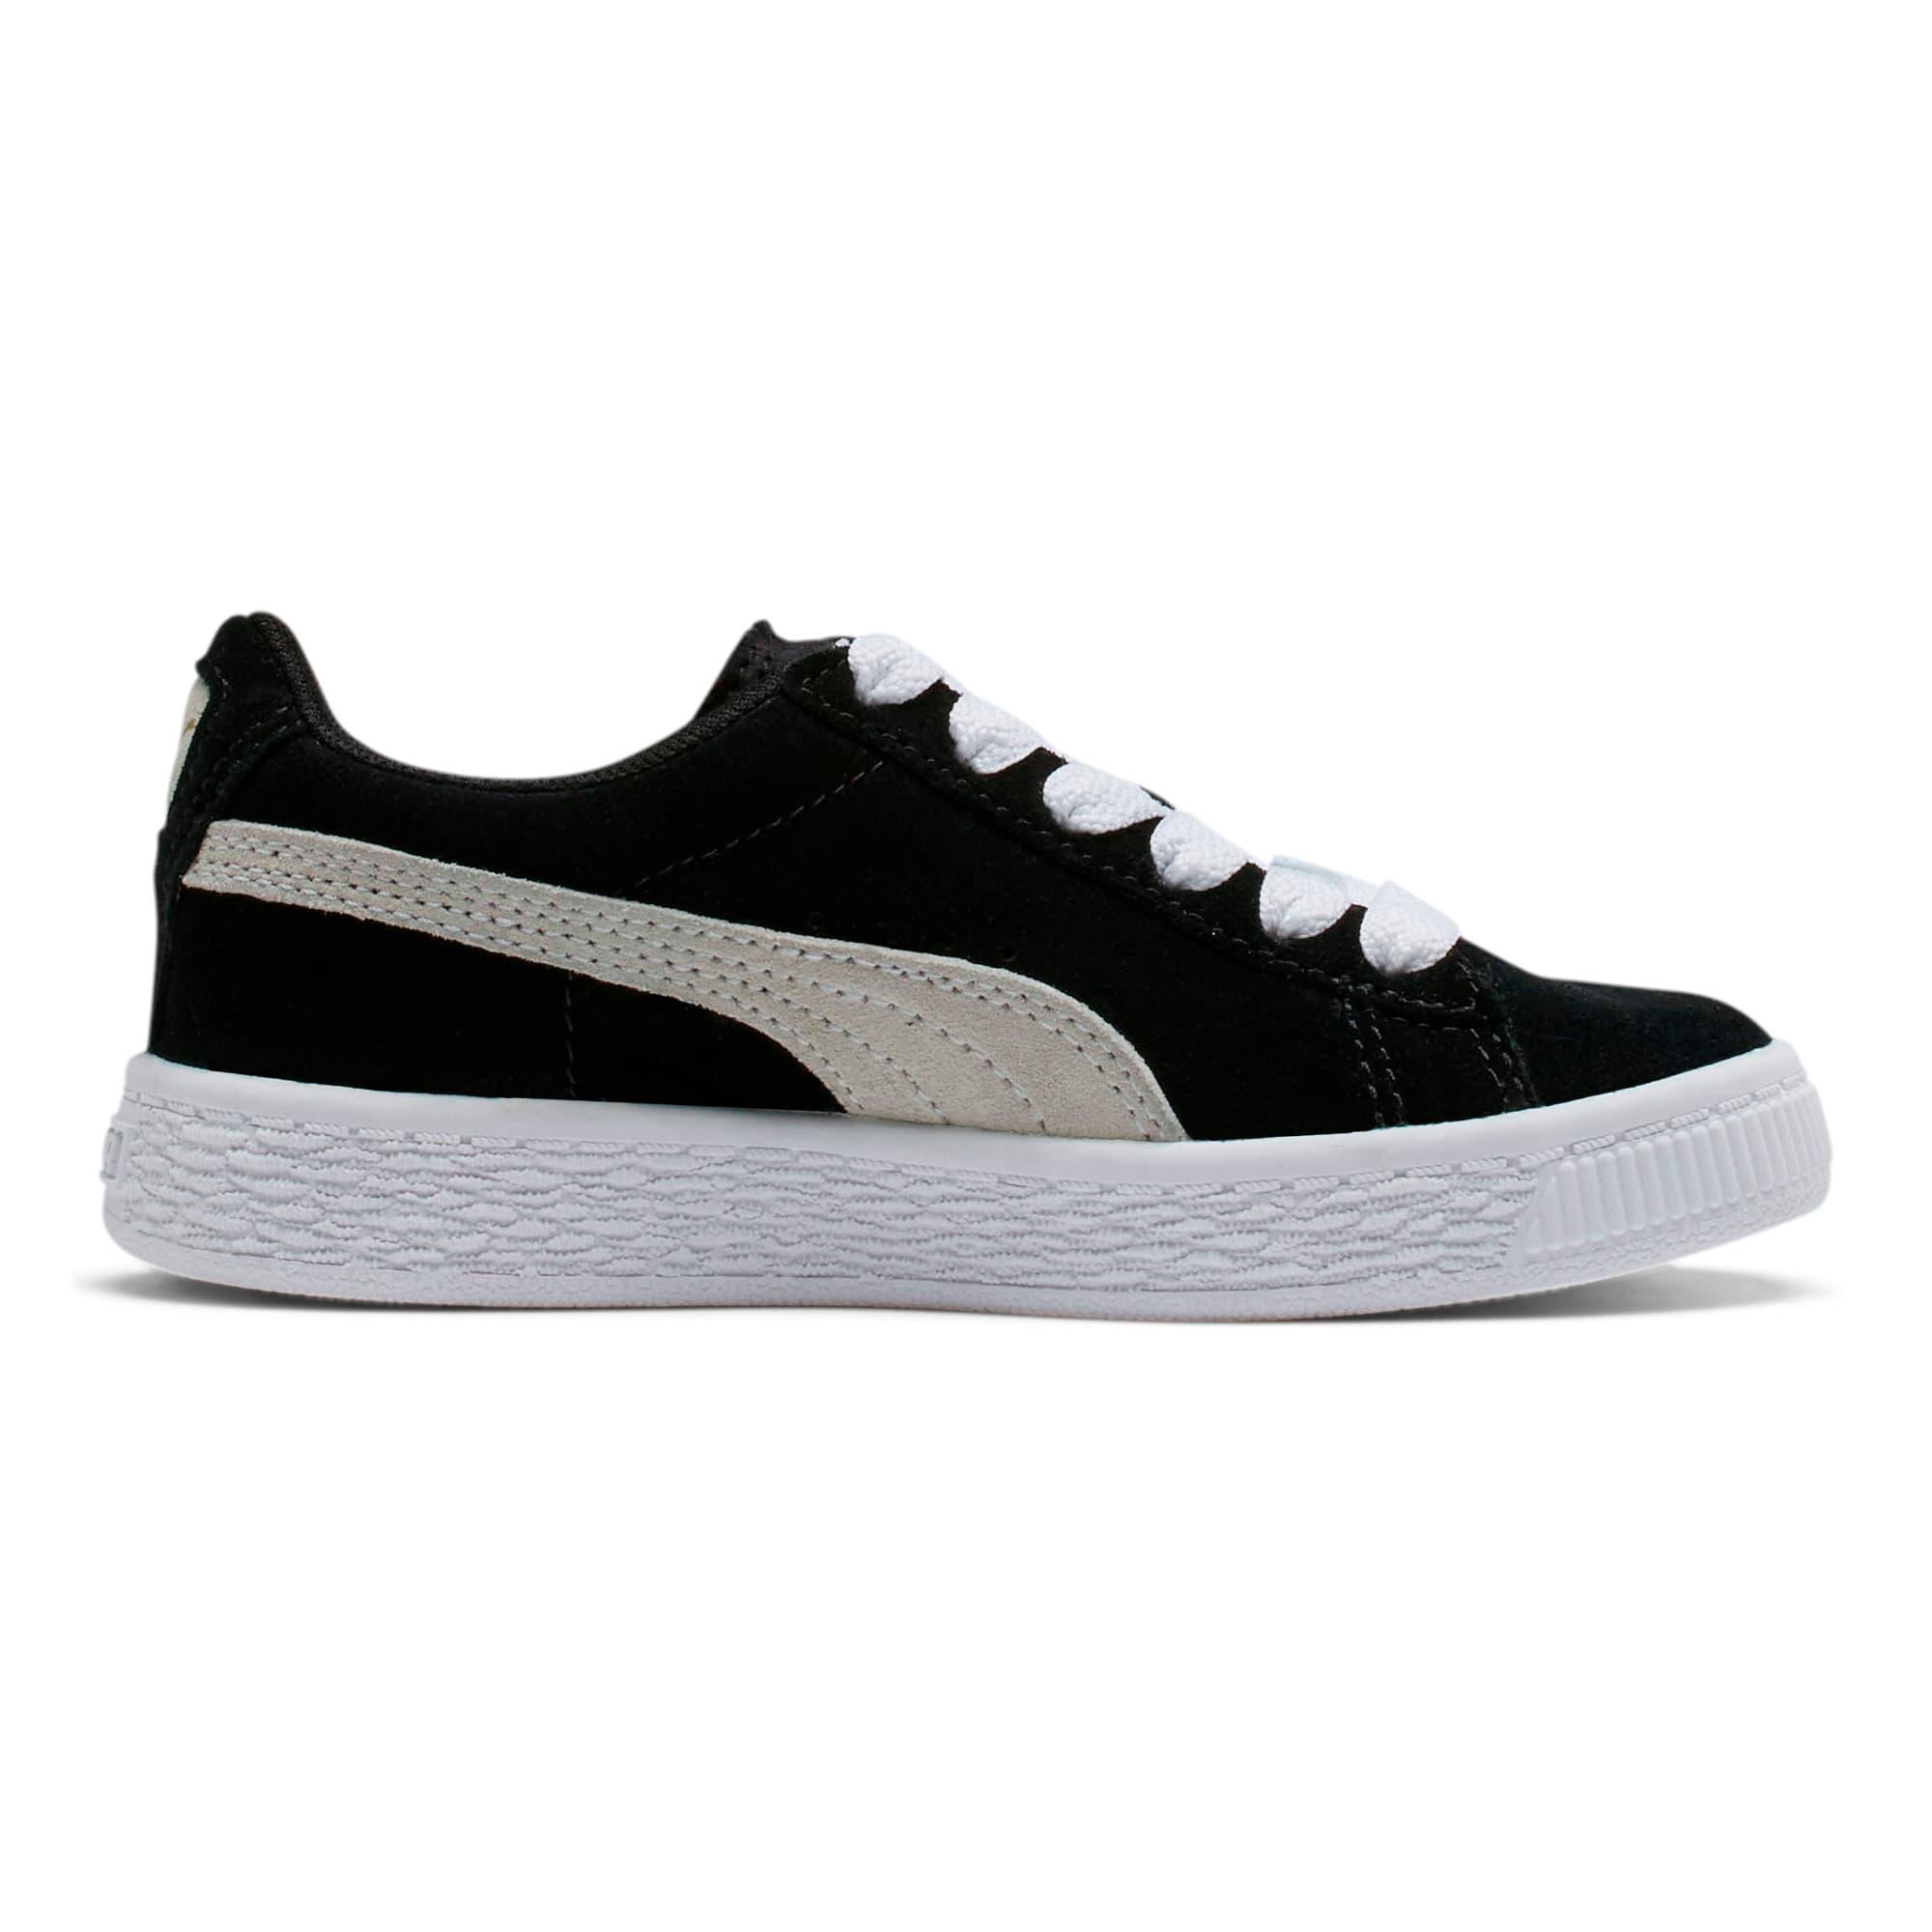 Thumbnail 5 of Suede Little Kids' Shoes, Puma Black-Puma White, medium